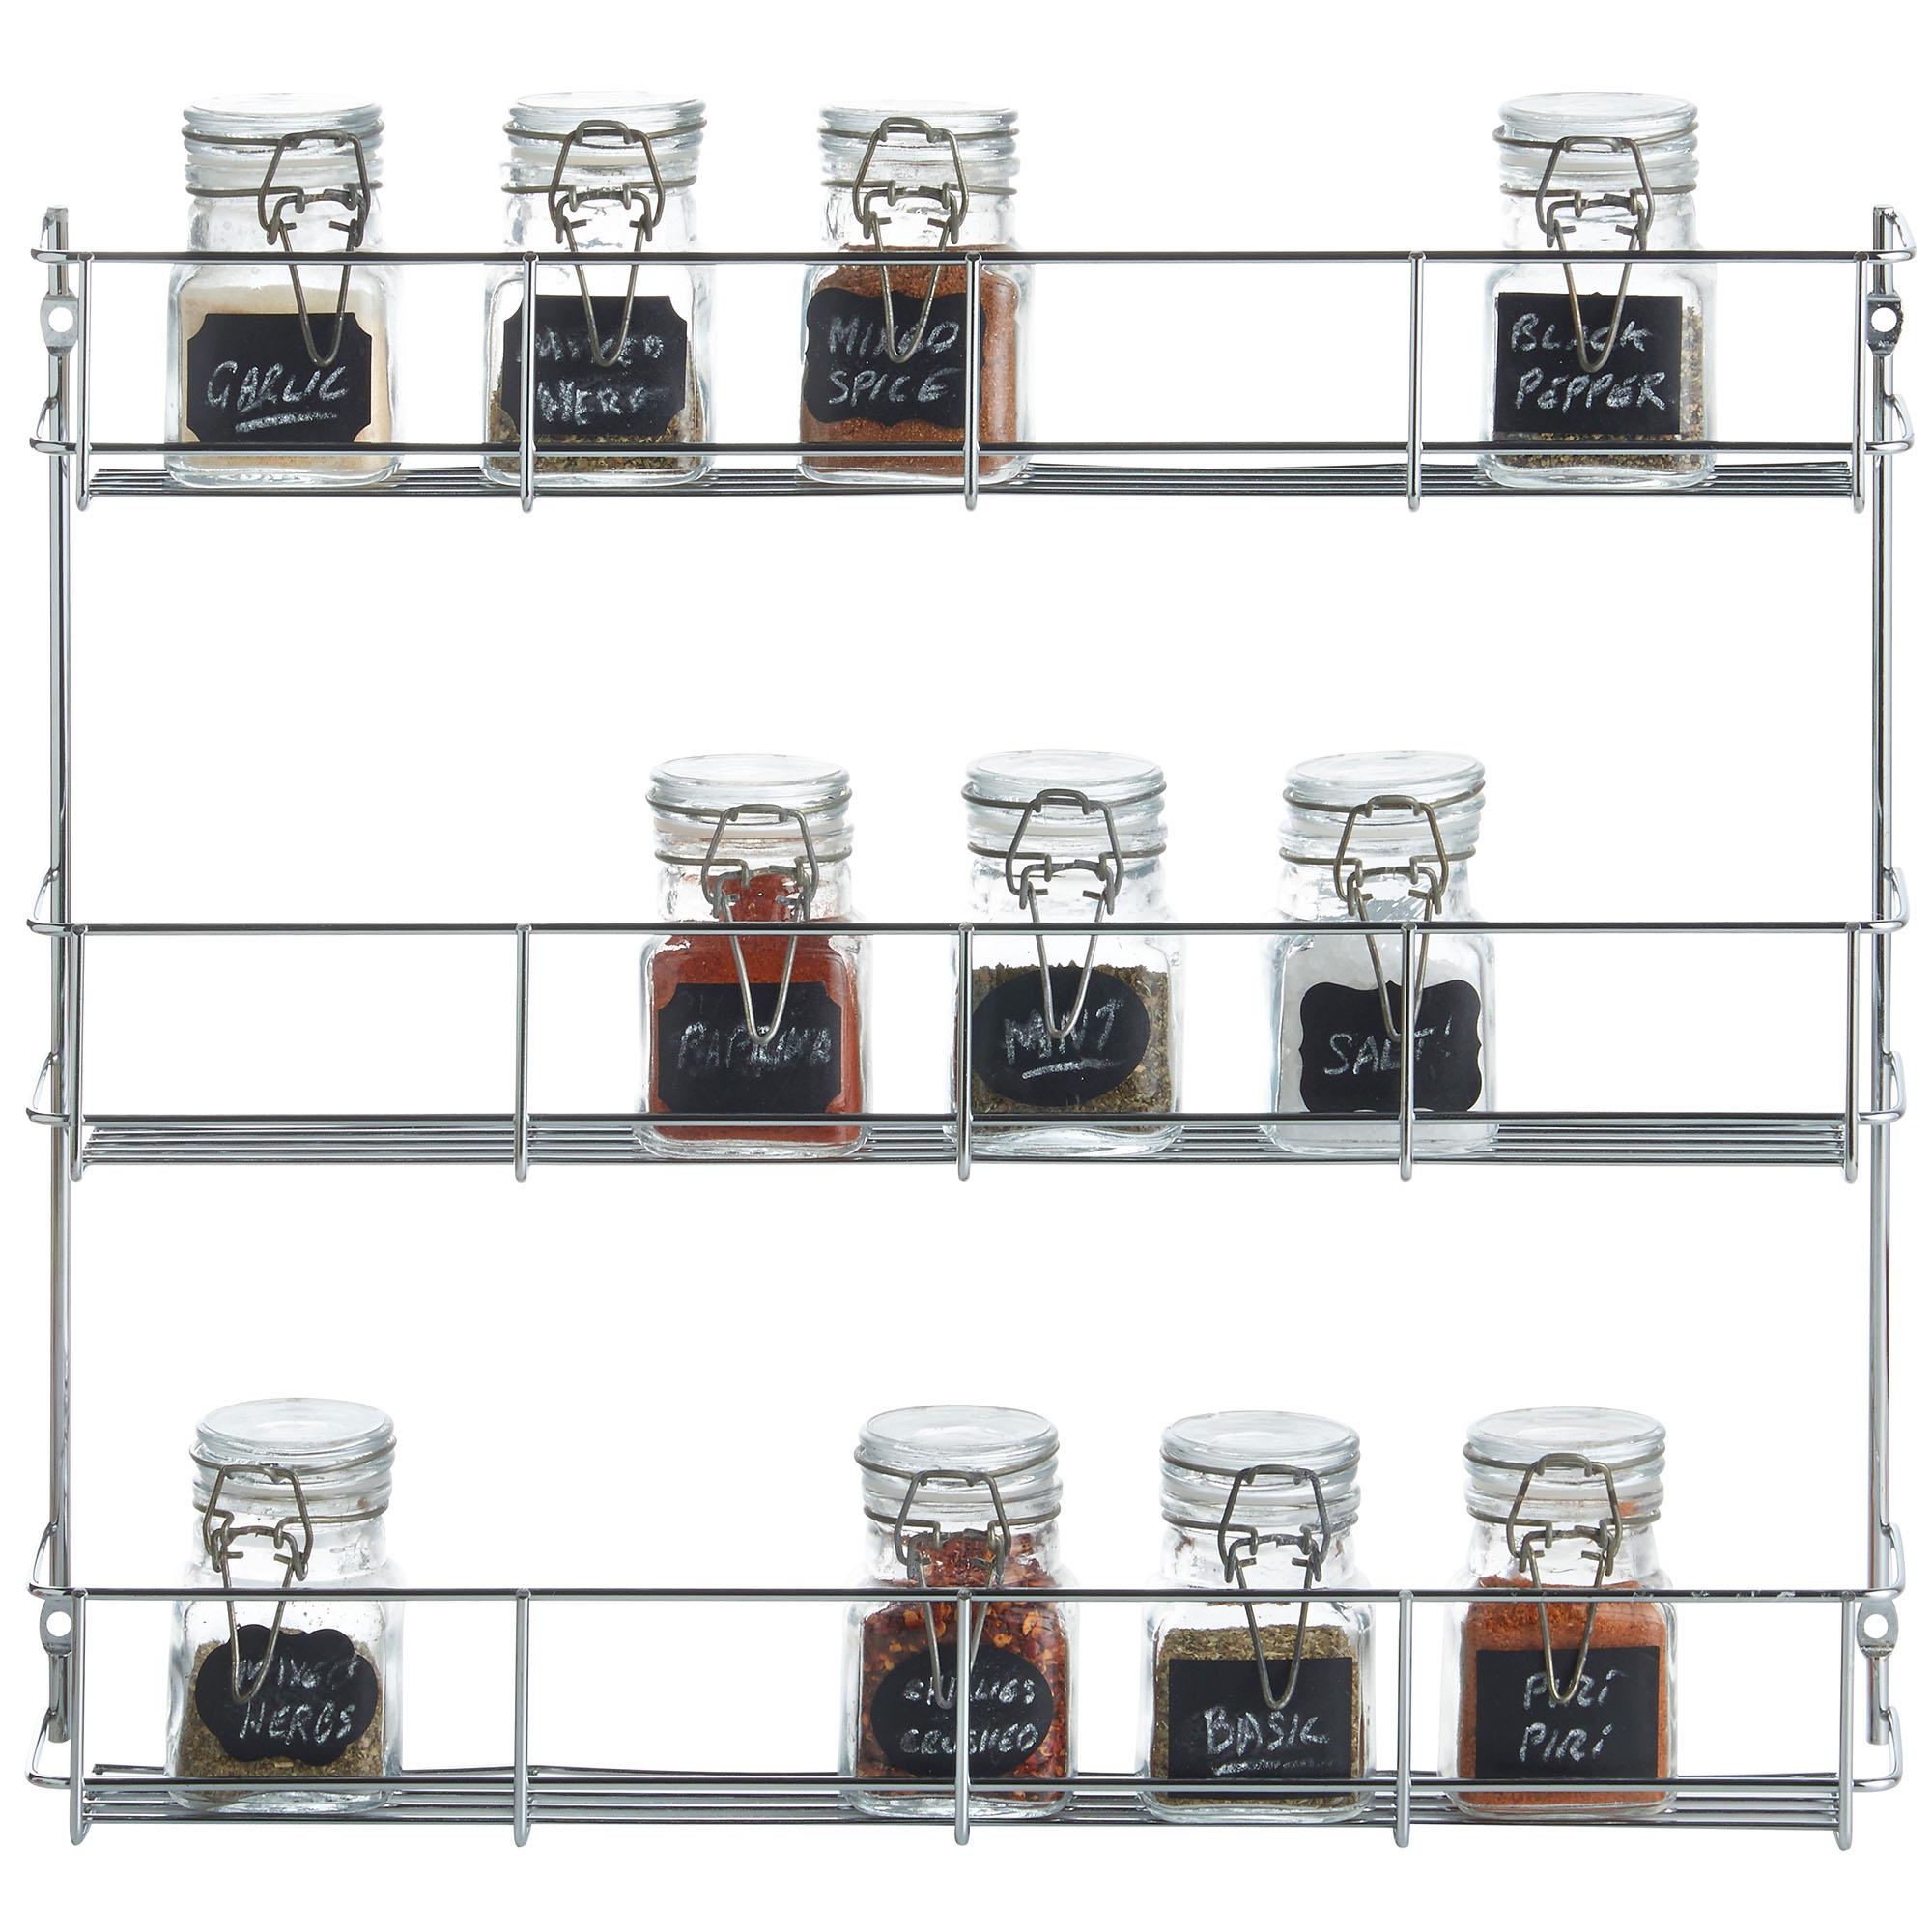 vonshef 1 6 tier spice herb rack jar bottle storage for kitchen cupboard door ebay. Black Bedroom Furniture Sets. Home Design Ideas